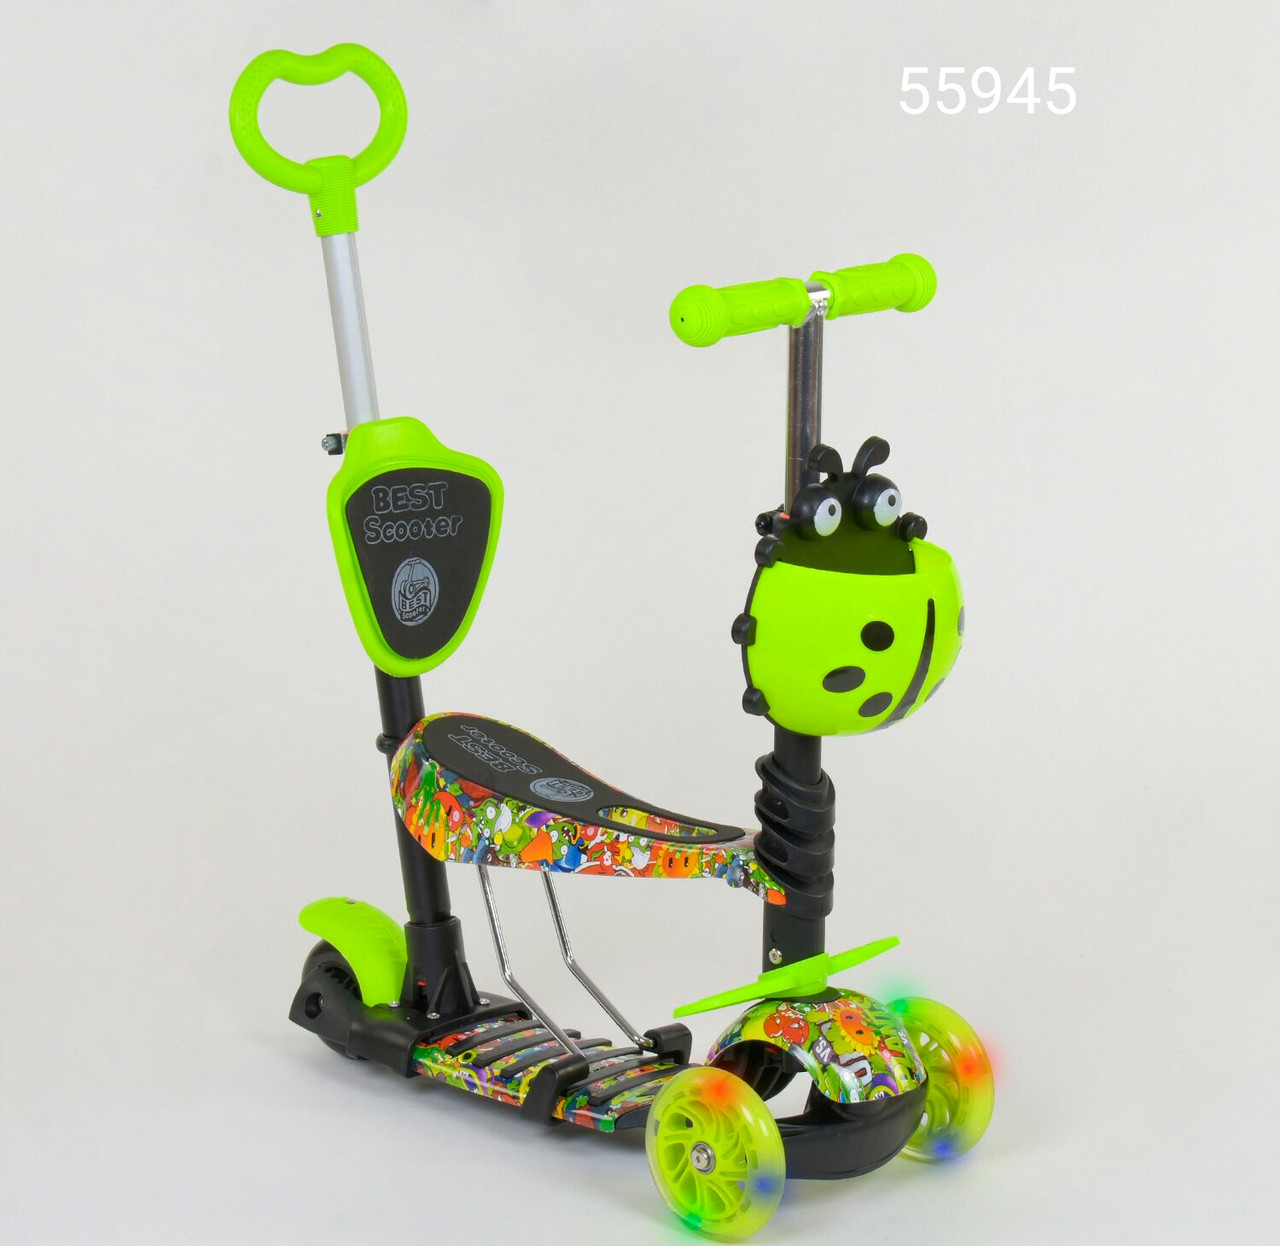 Самокат Best Scooter K 5 в 1 з ручкою 55945